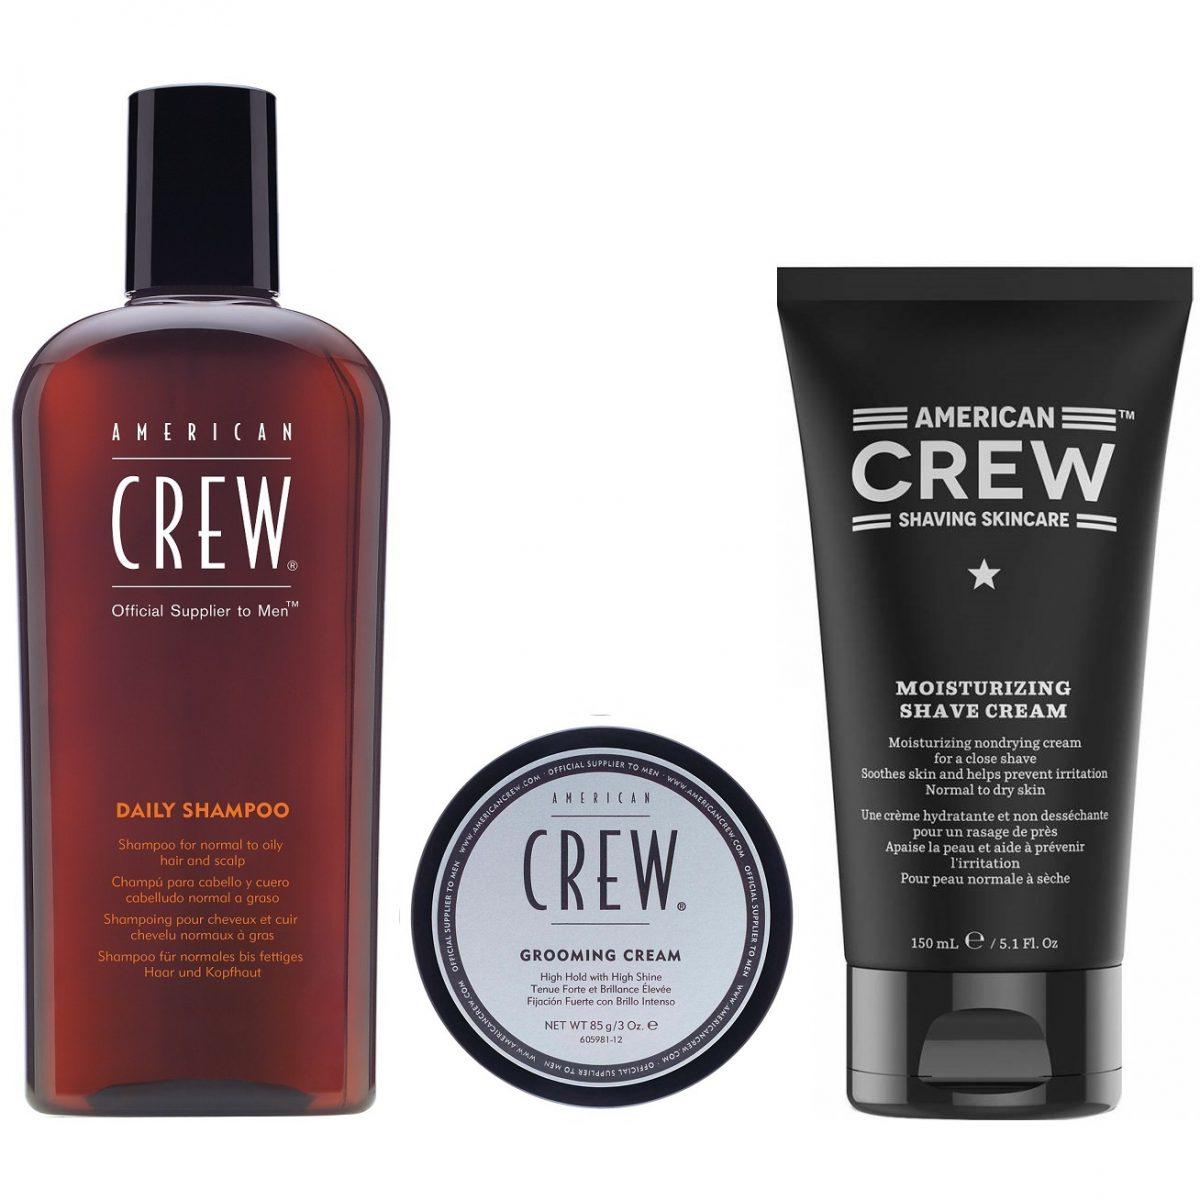 56_American-Crew-Daily-Shampoo-250ml_Grooming_Cream_85gr_Moisturizing_Shave_Cream_150ml.jpg